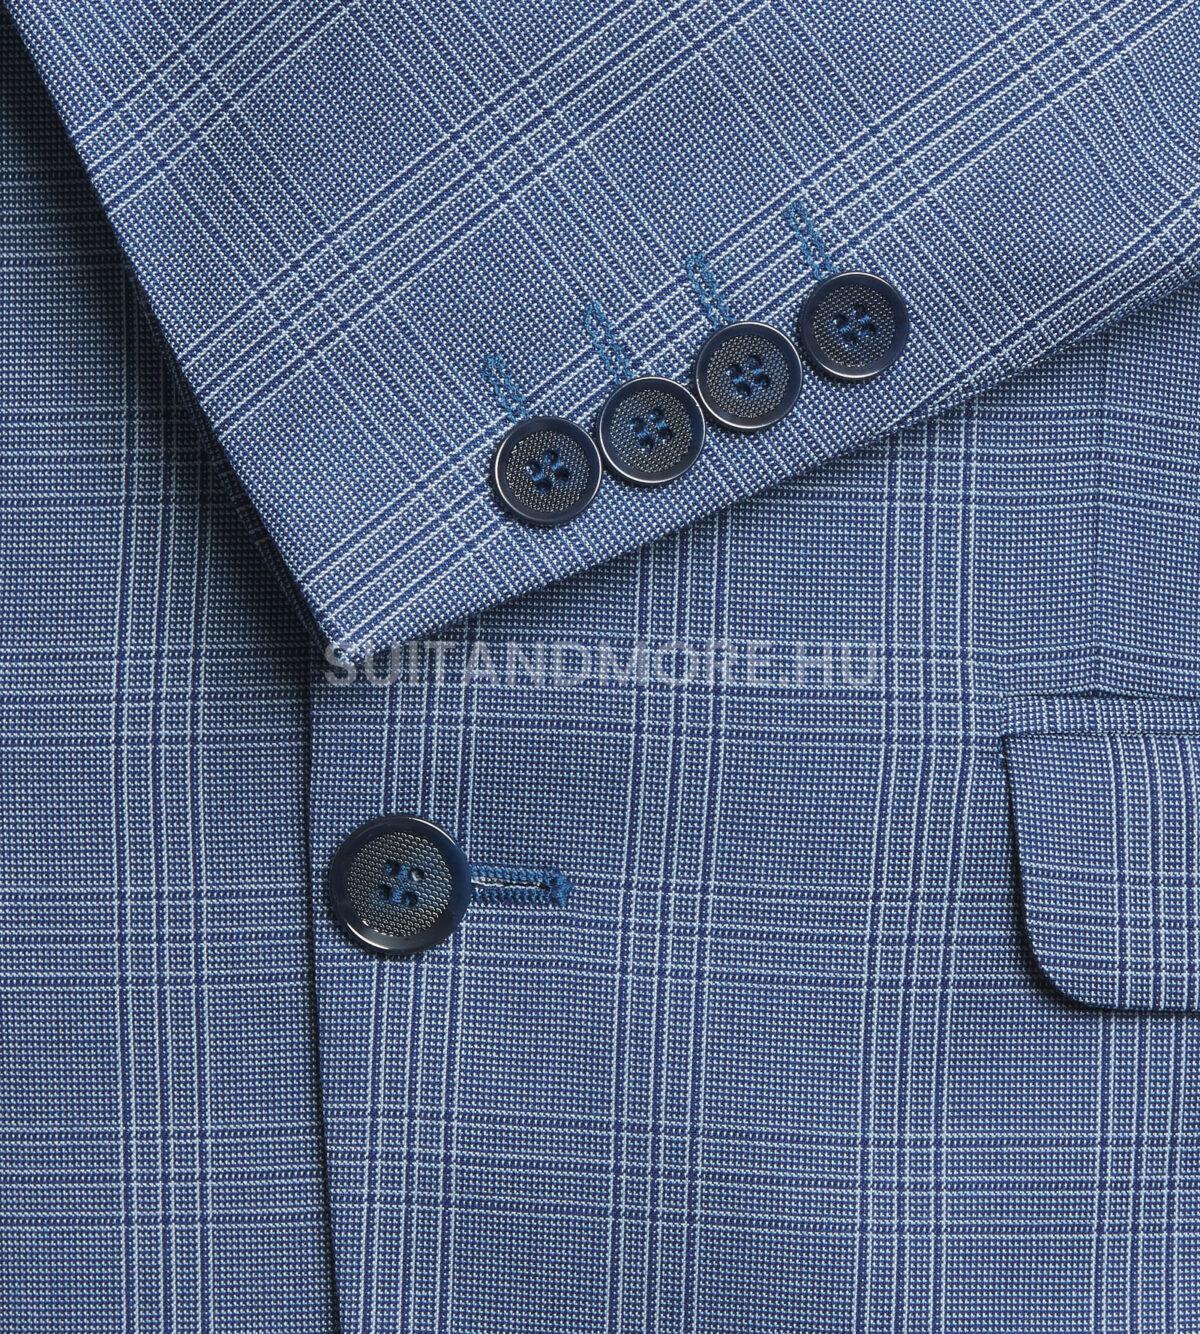 DIGEL-Move-kék-extra-slim-fit-kockás-zakó-NANNO-NATE-NICOLO-99727-25-04